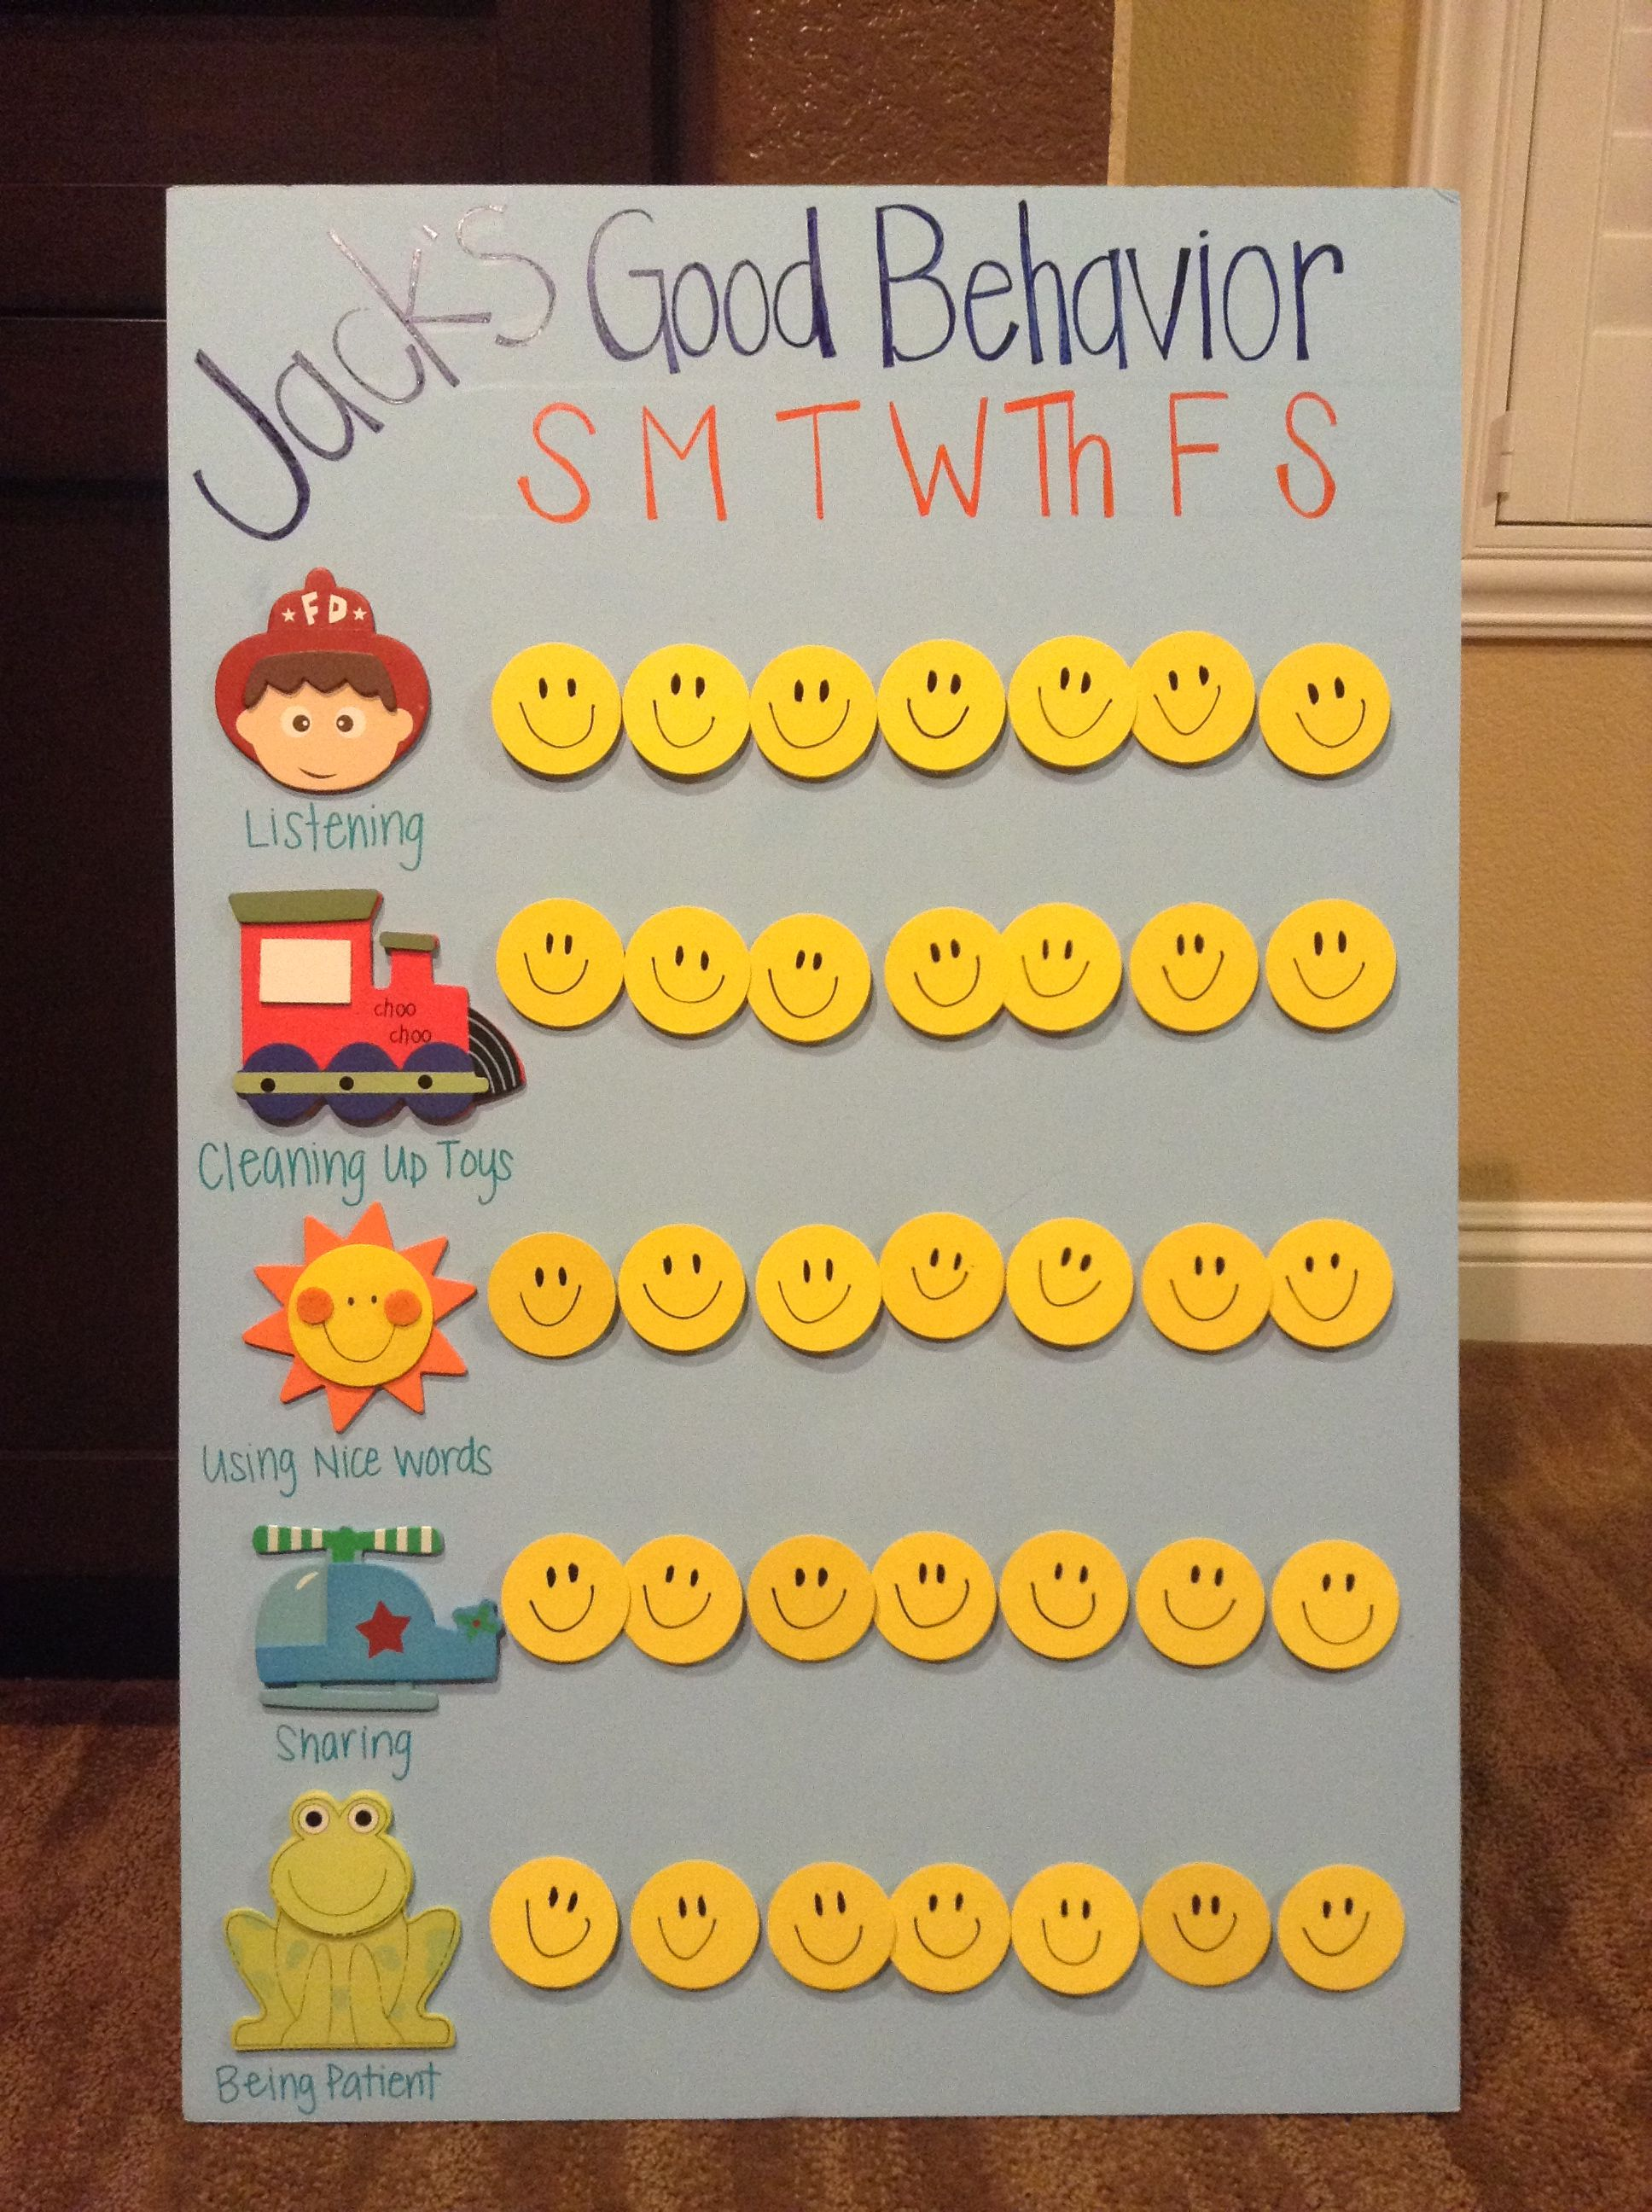 Behavior Board Chore Chart Etsy Shop Funhappymom Worked